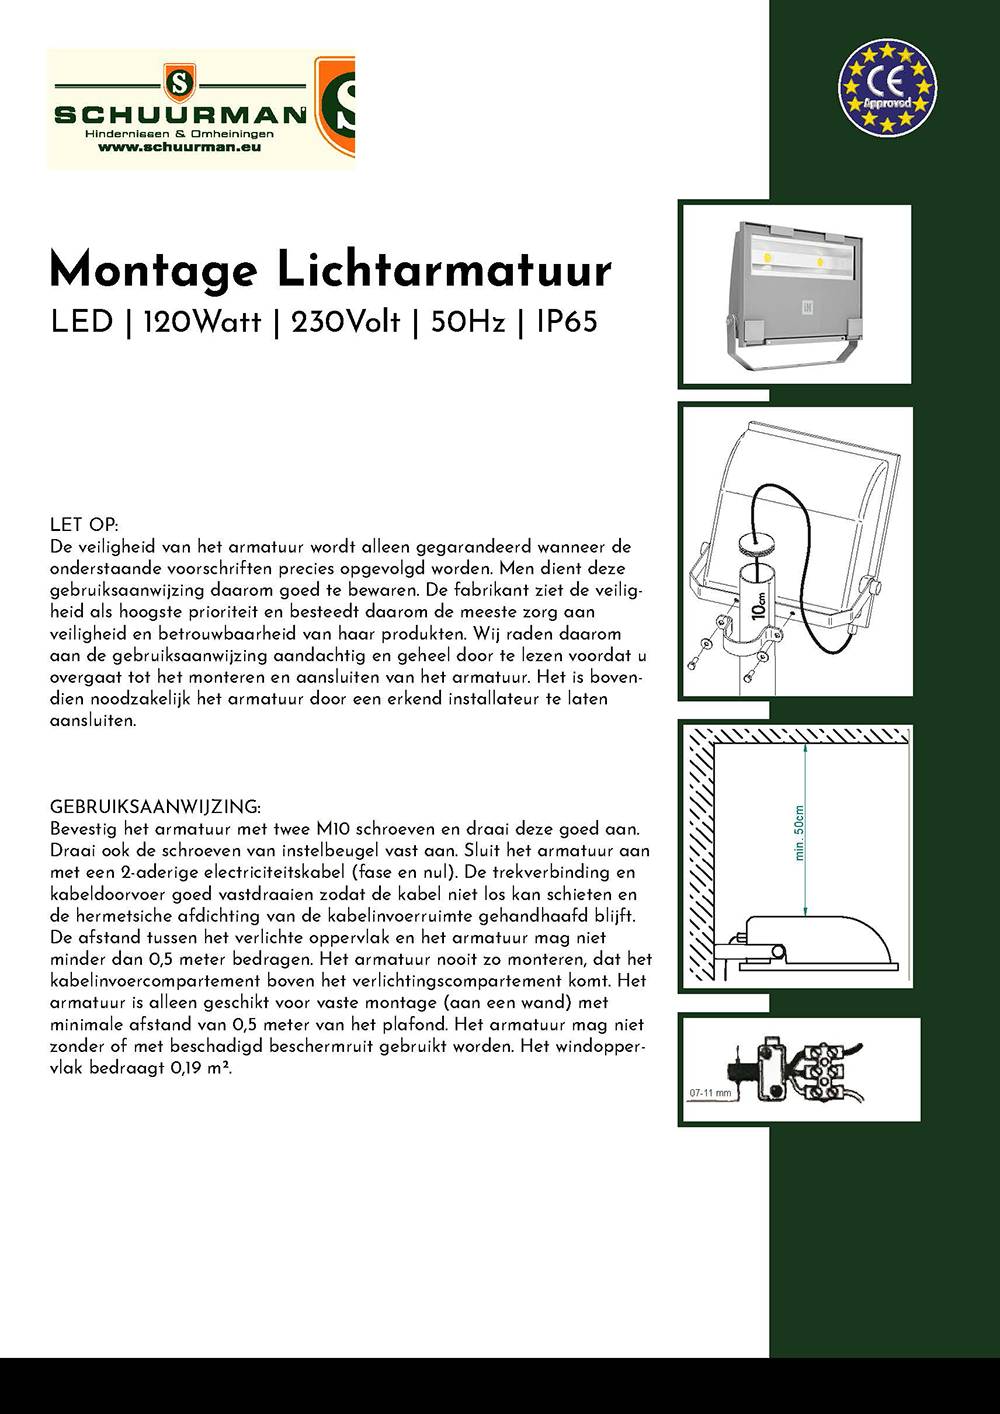 brochure-montage-lichtarmatuur-LED